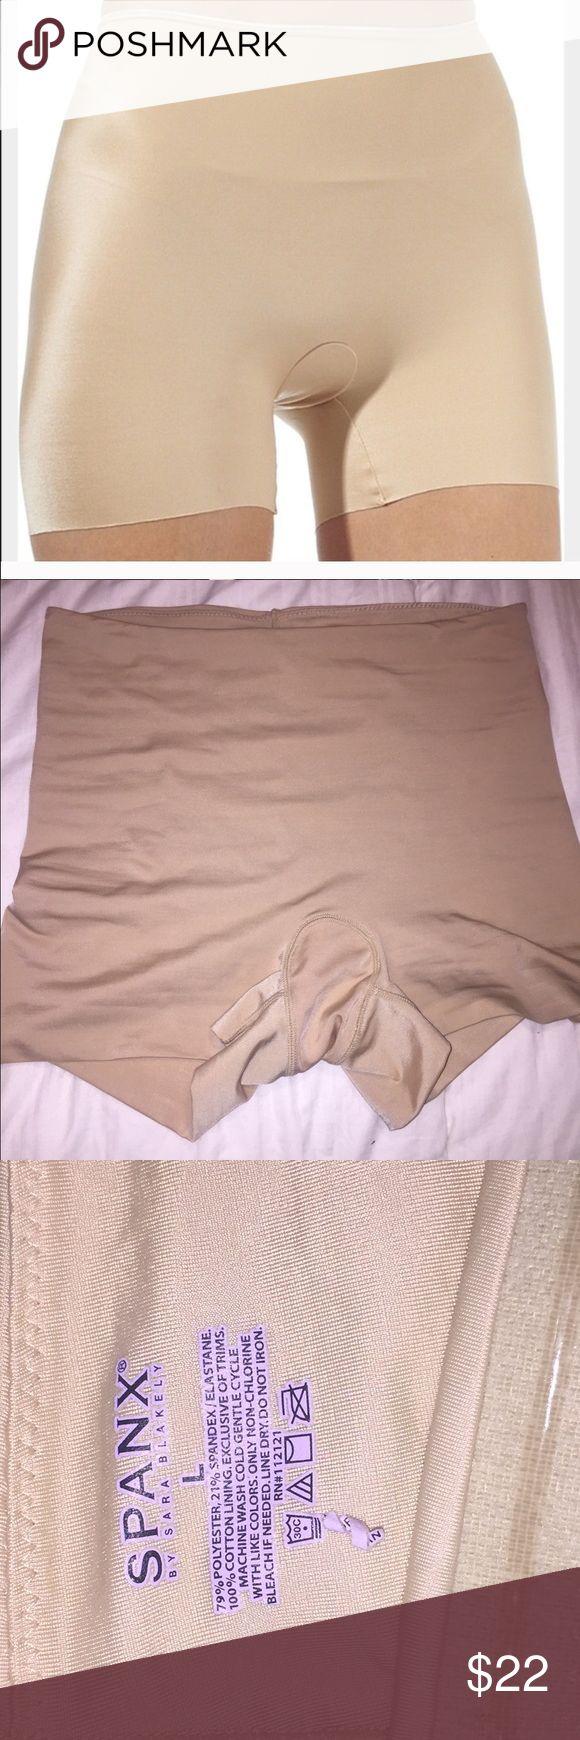 SPANX size large No snags inseam is 2.5 SPANX Intimates & Sleepwear Shapewear